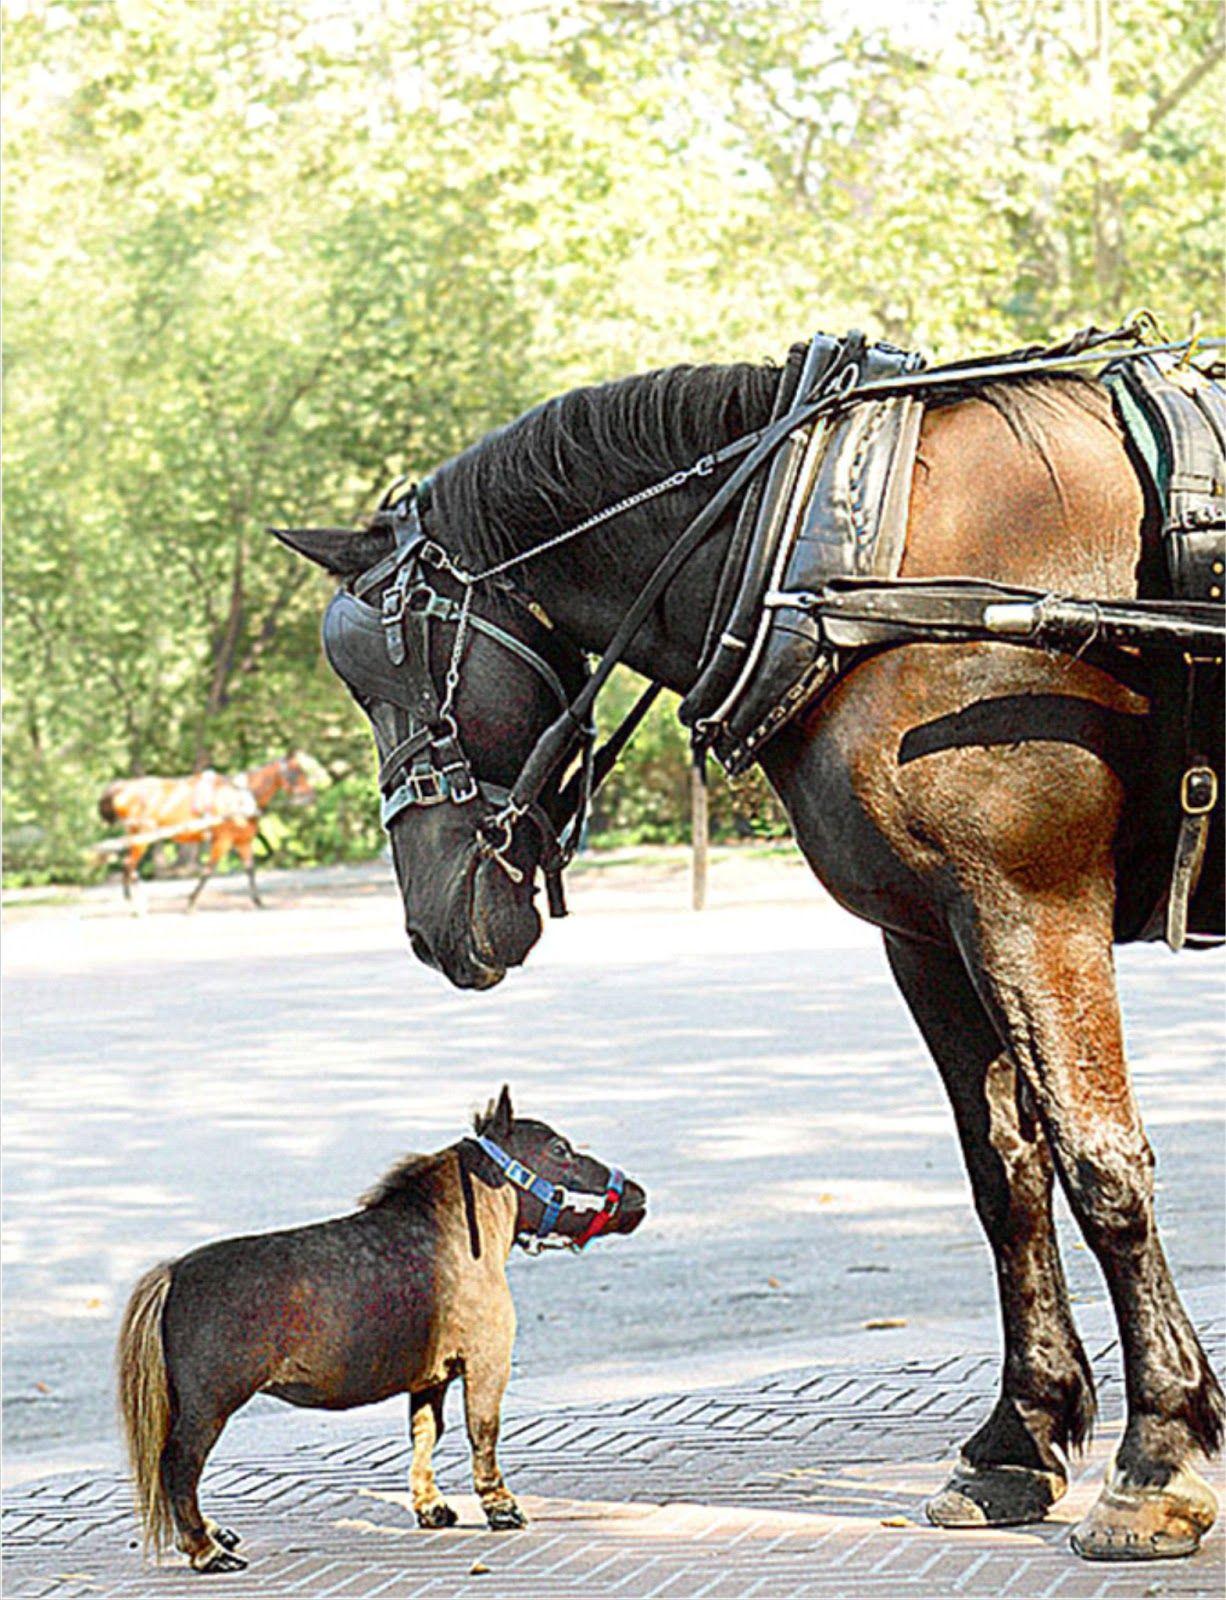 Funny Horse Thumbelina Kuda Terkecil Di Dunia Animals